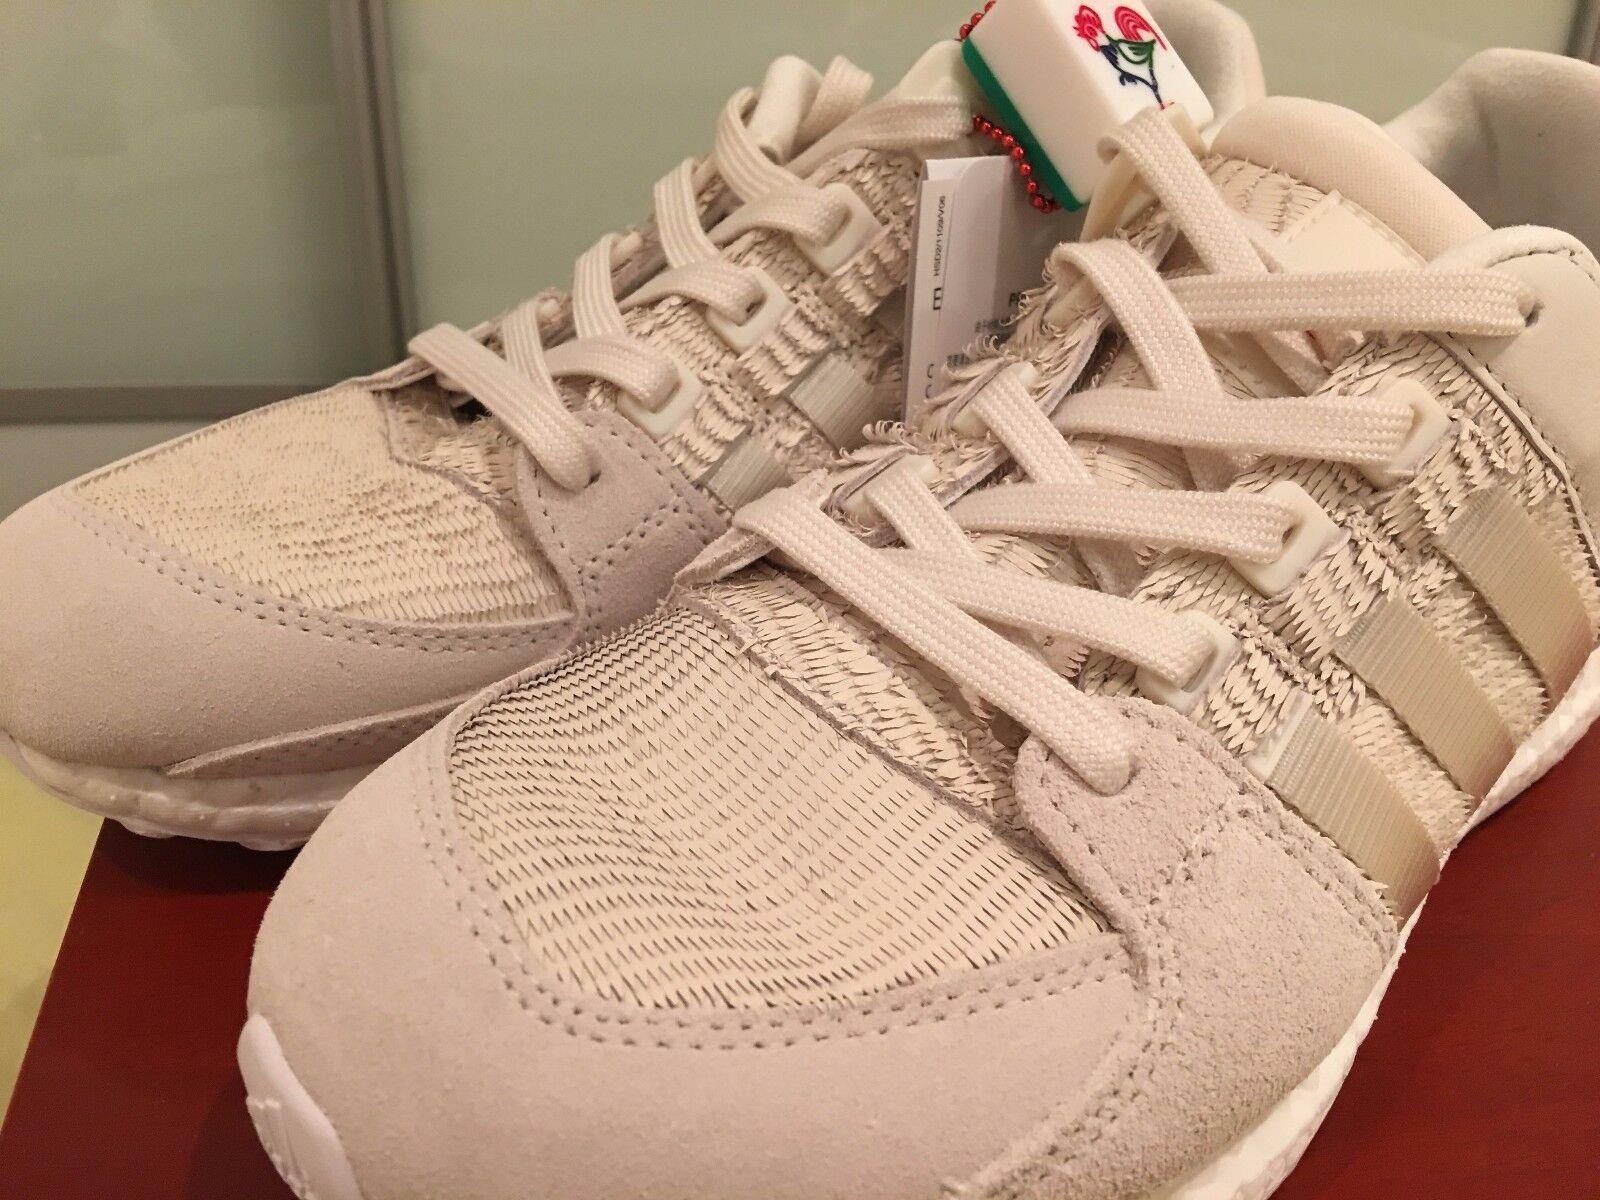 Adidas Originals Pharrell Taille Human Race Nmd Multi Taille Pharrell UK 9.5 33c31f